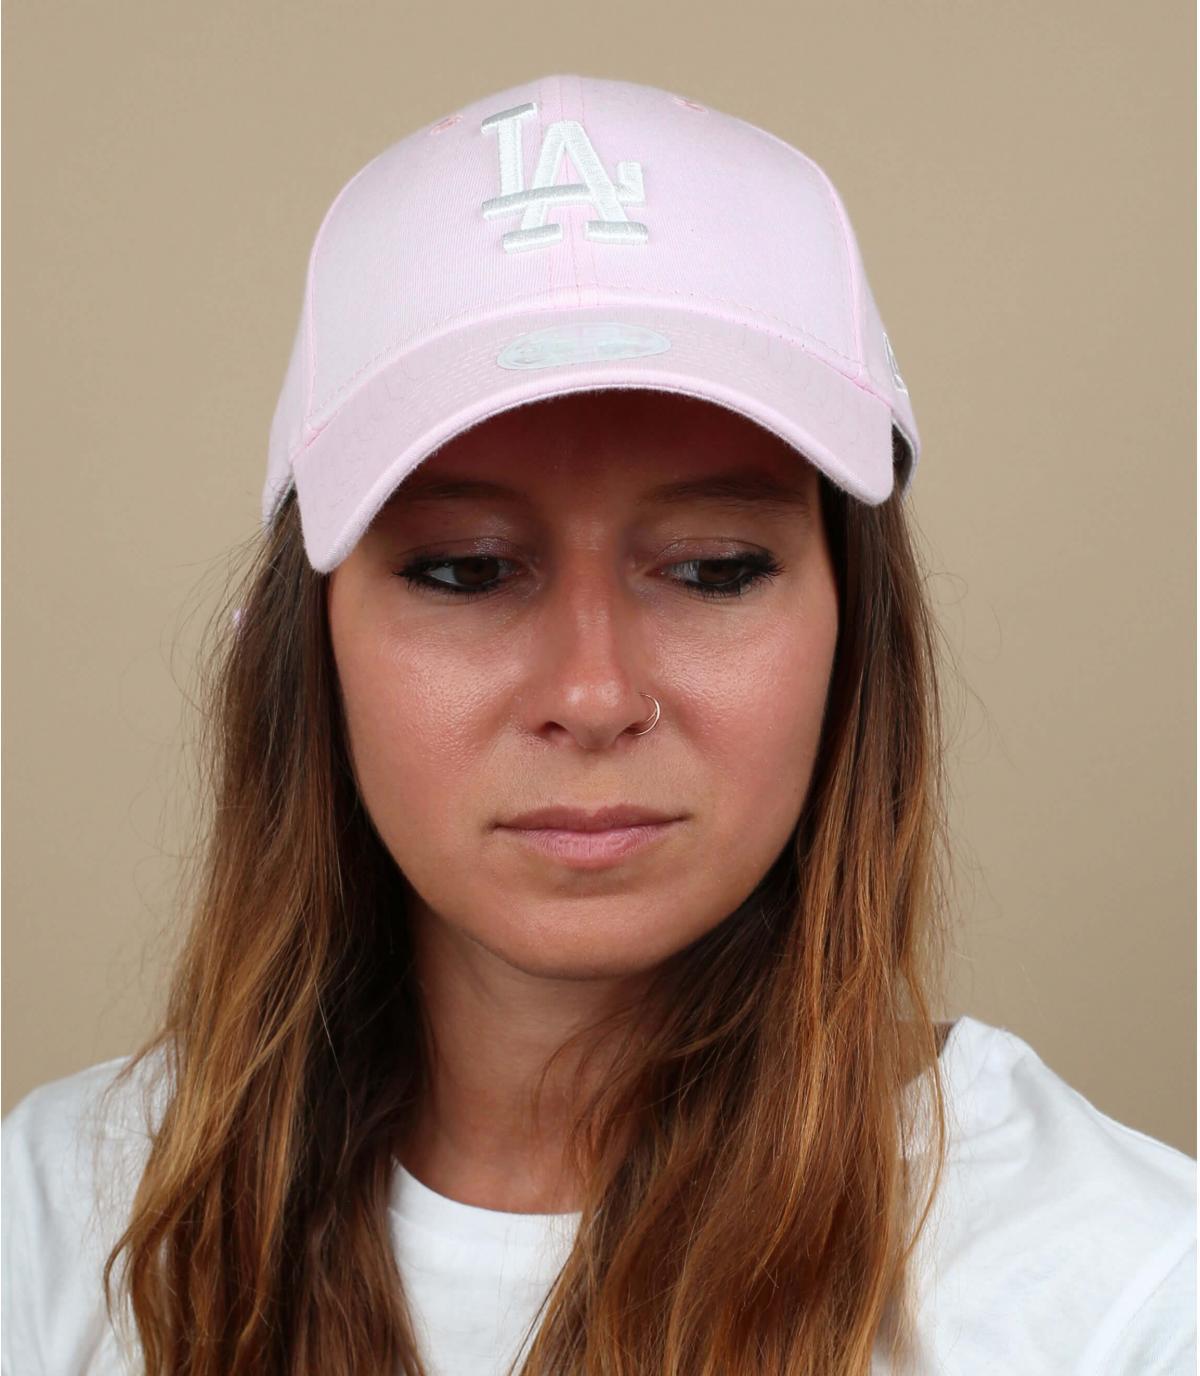 gorra mujer LA rosa